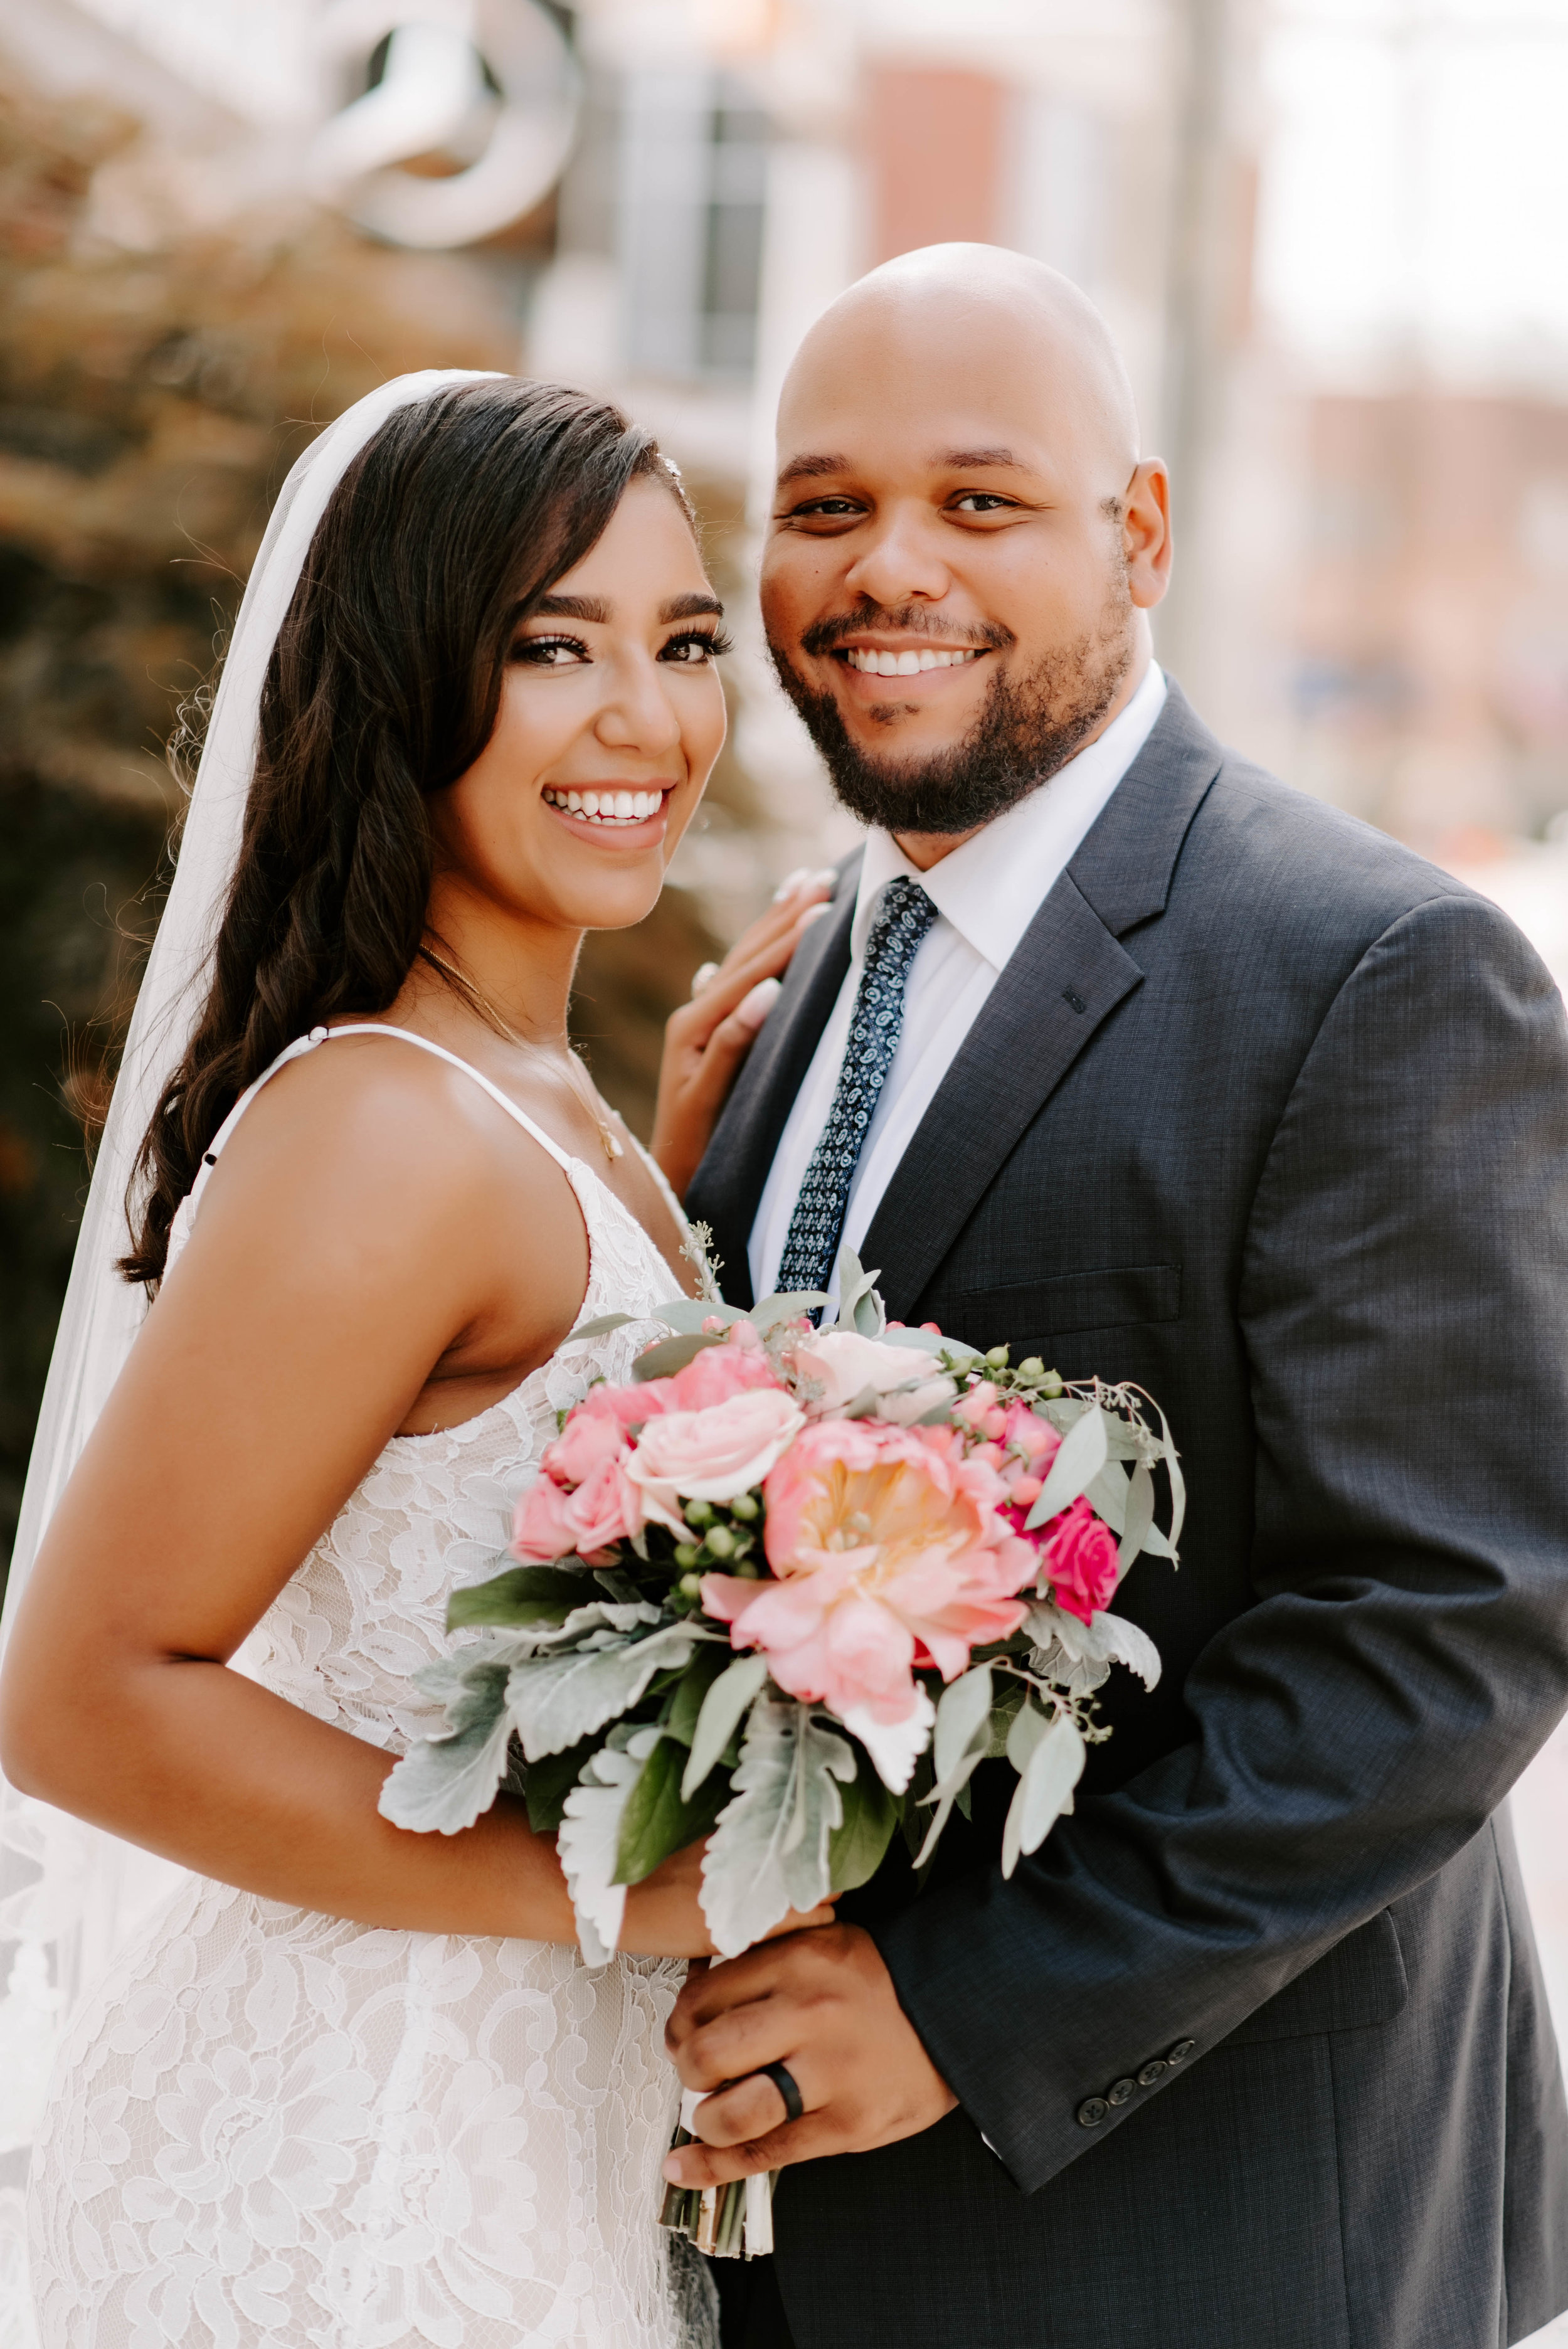 annapolis_courhouse_wedding_003-6.jpg